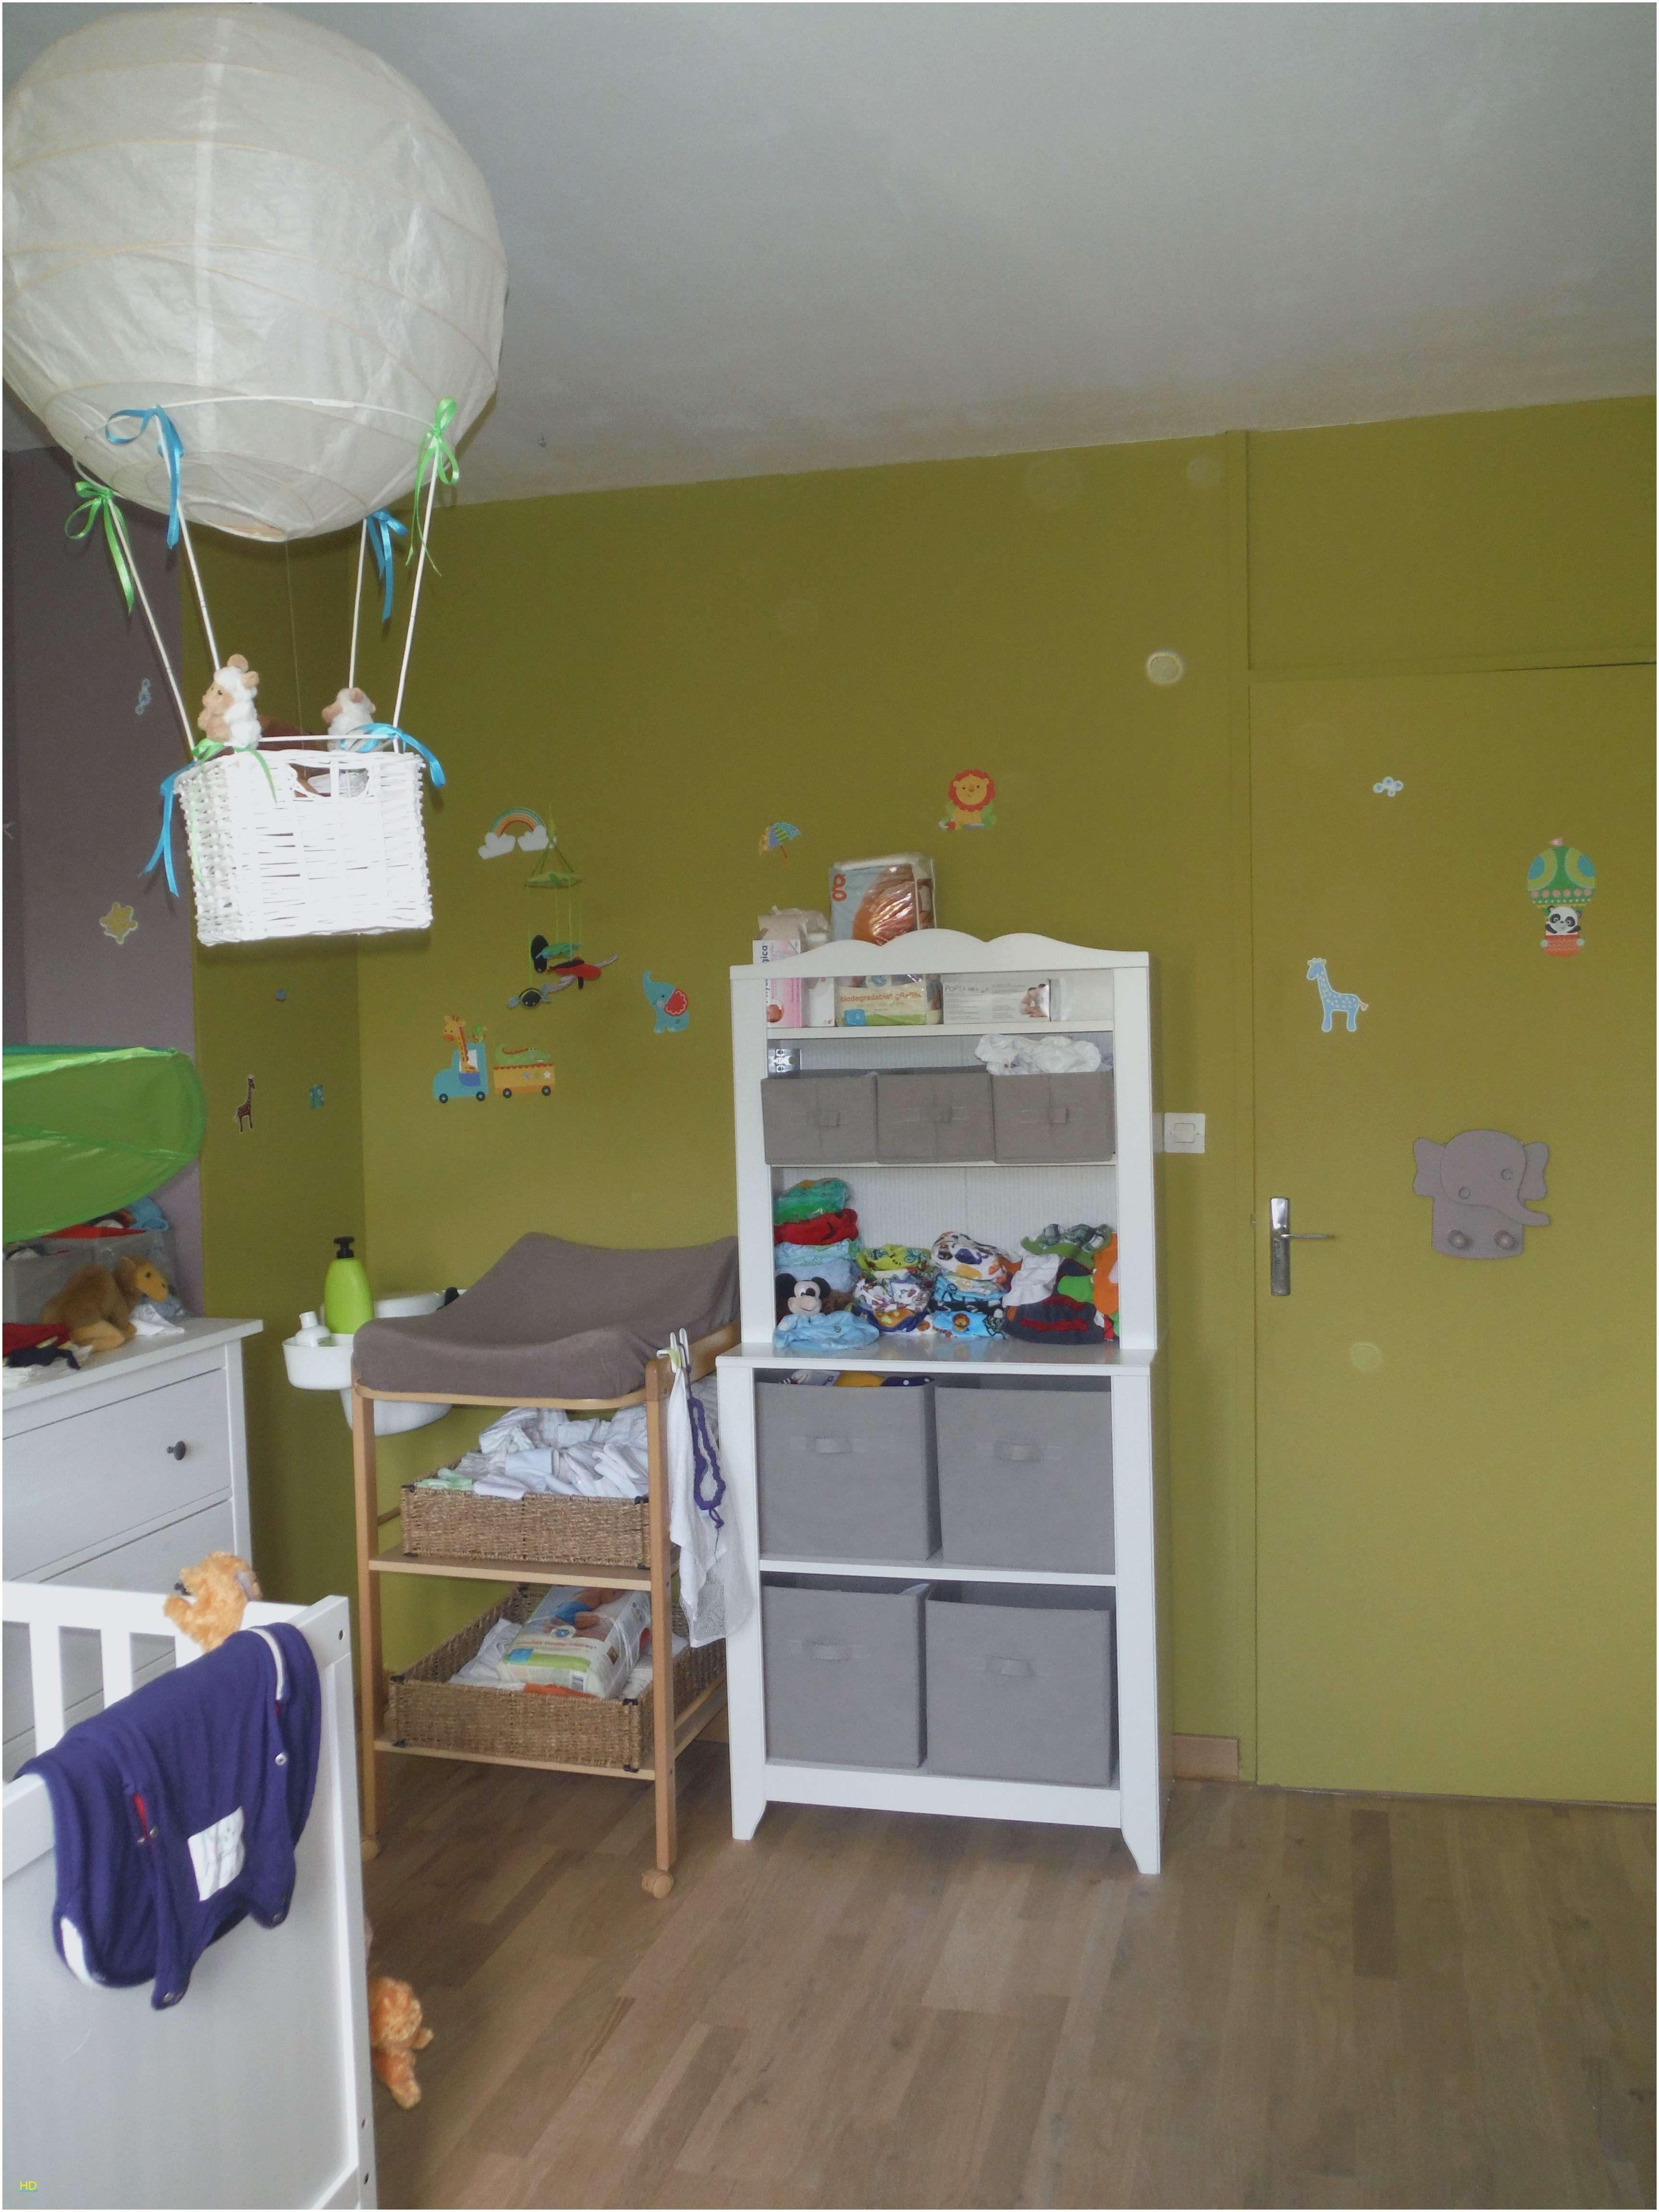 Lit Mezzanine Ado Ikea Magnifique 68 Lit Mezzanine Ado Concept Jongor4hire